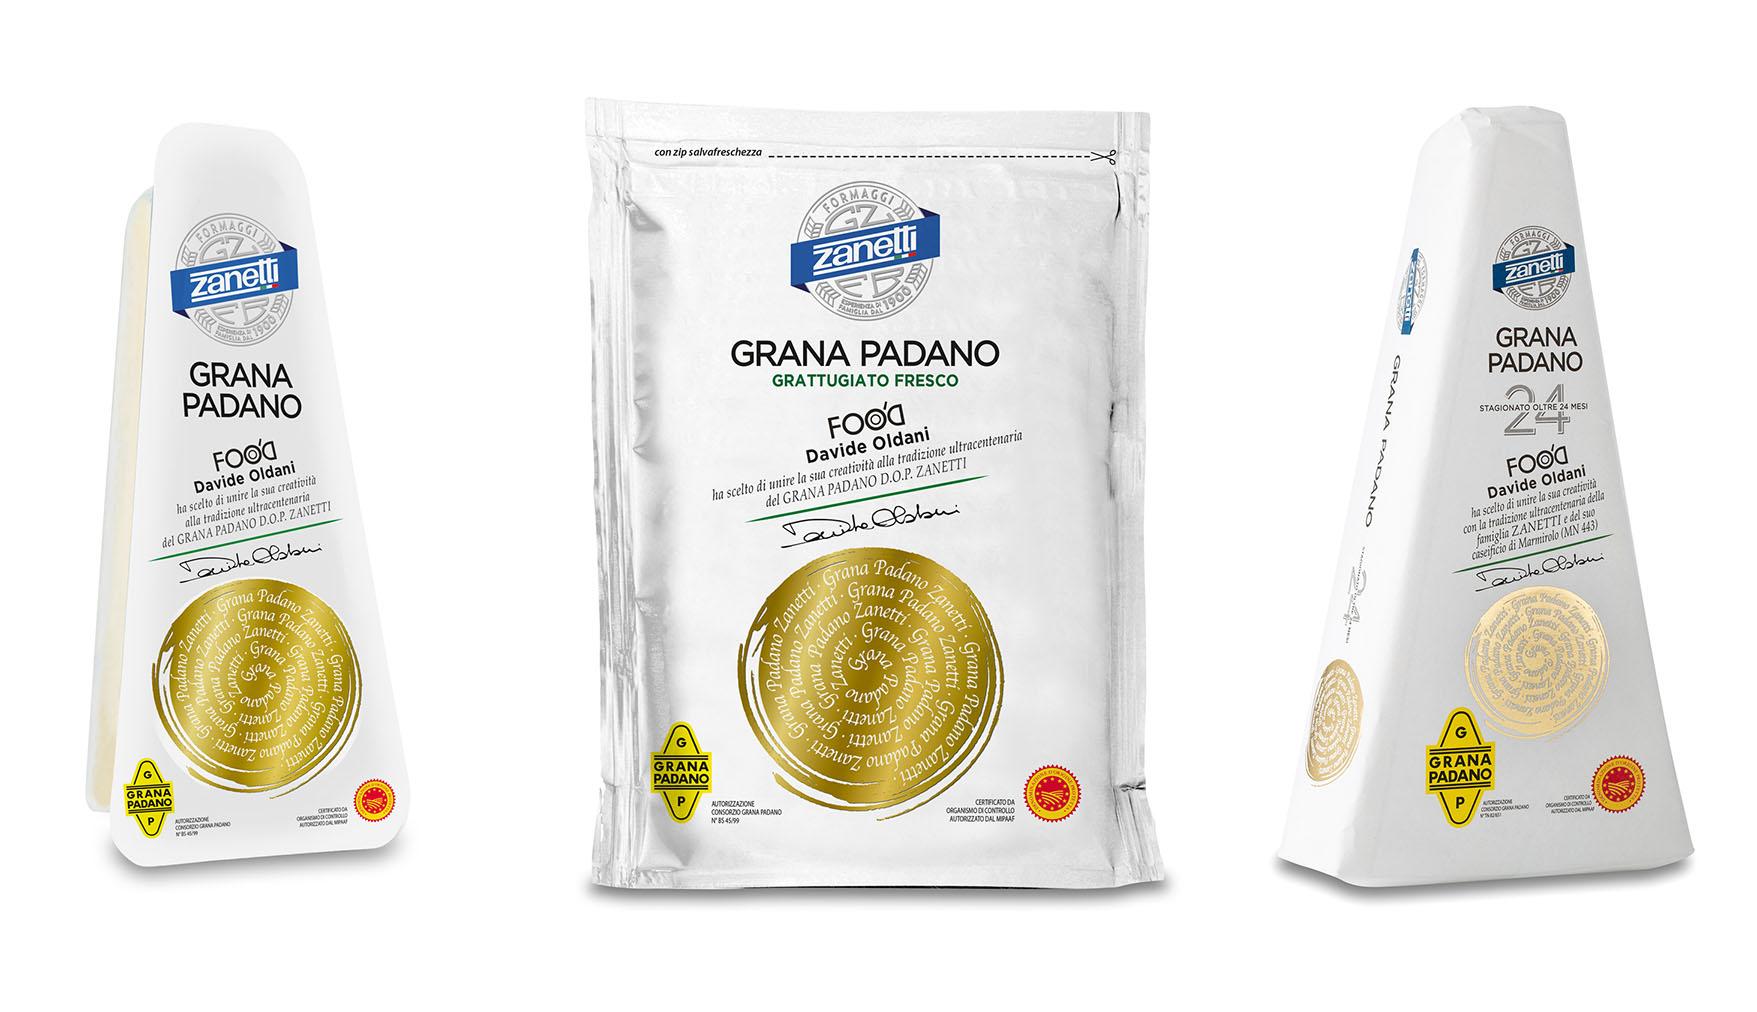 Zanetti: nuova linea Grana Padano DOP firmata Davide Oldani